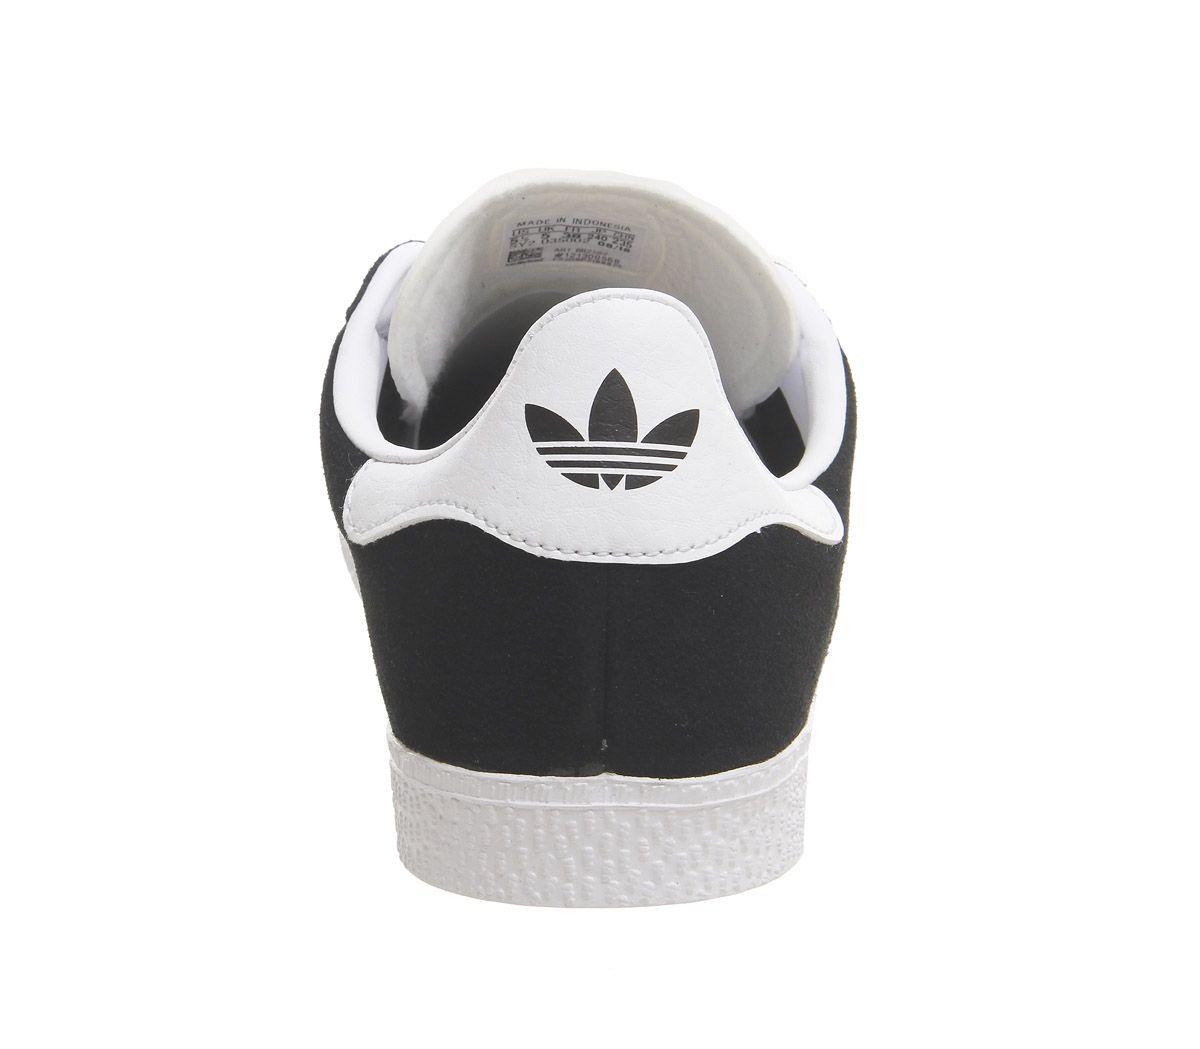 Womens-Adidas-Gazelle-Jnr-Trainers-Core-Black-Trainers-Shoes thumbnail 8